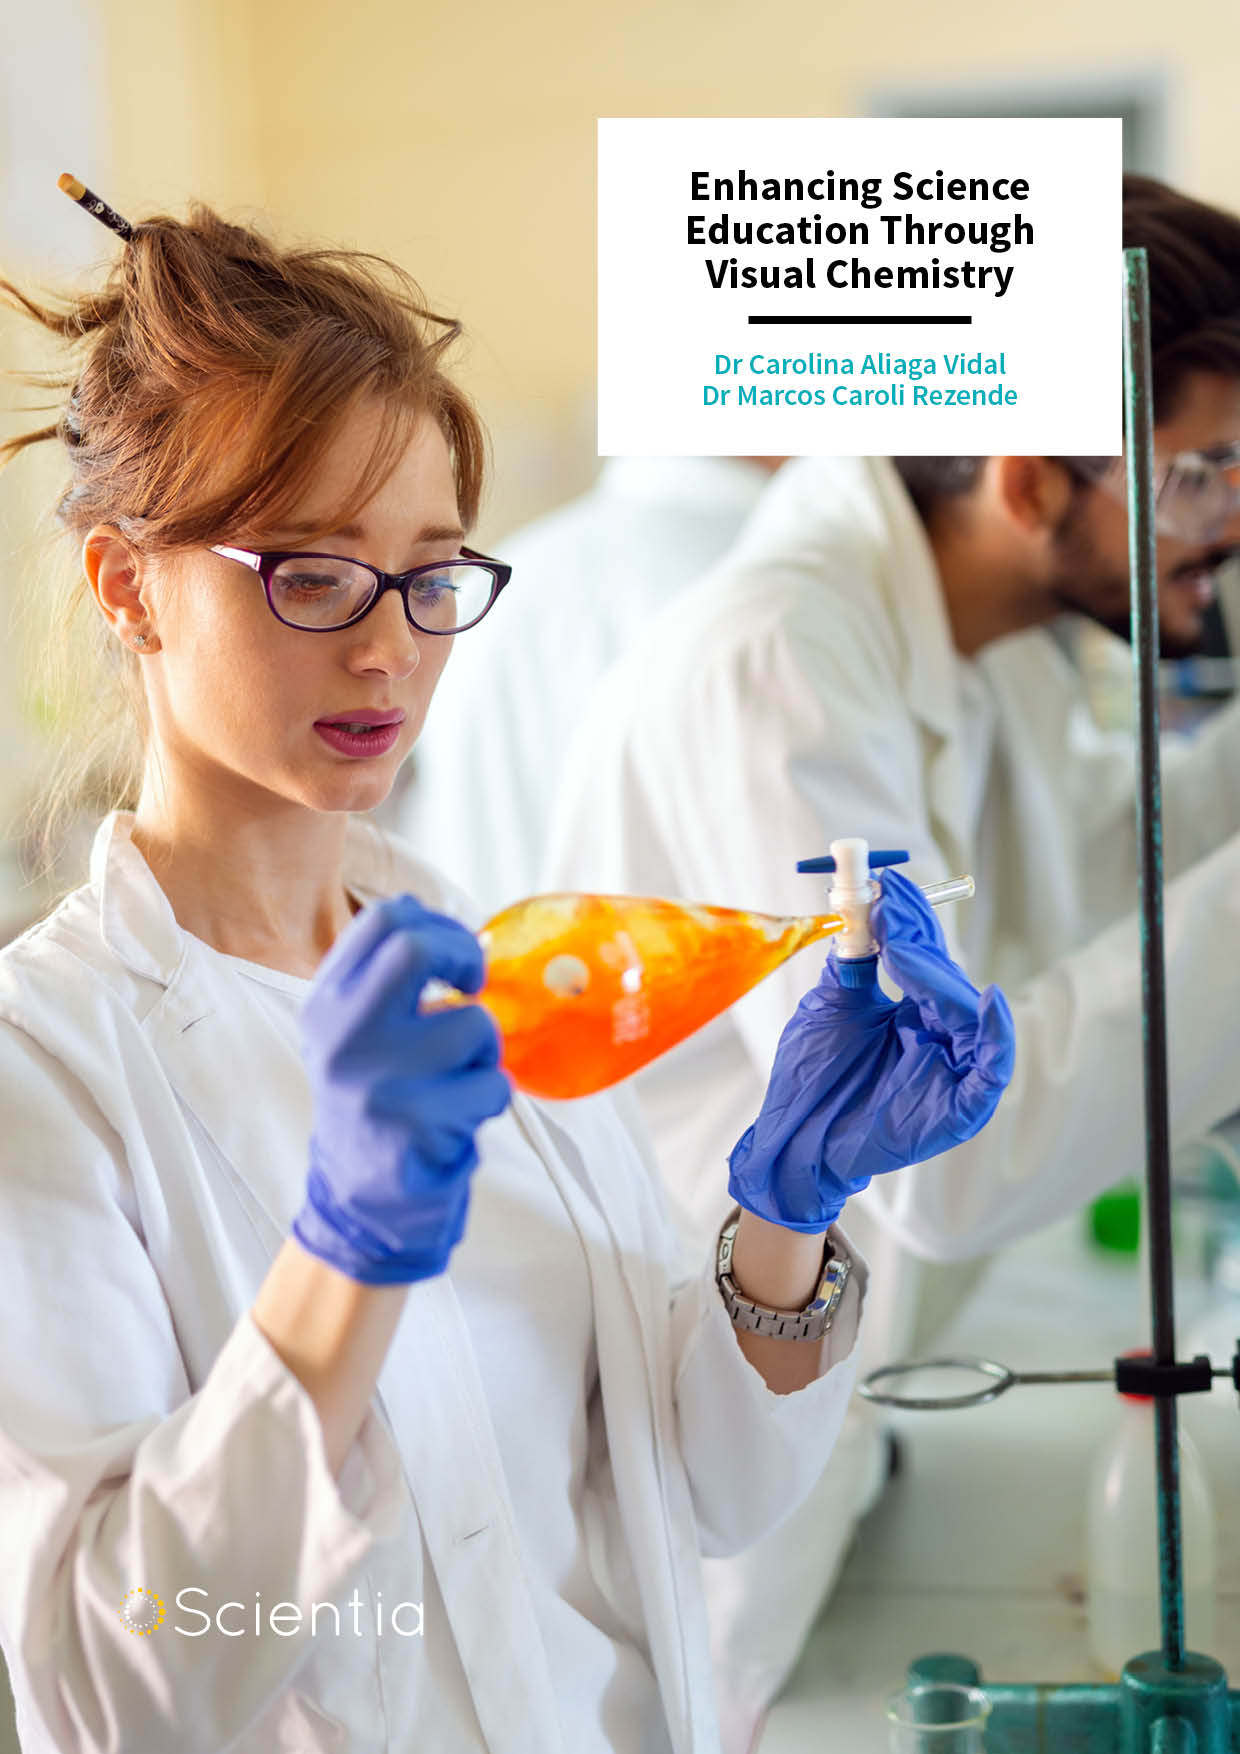 Dr Marcos Caroli Rezende | Dr Carolina Aliaga Vidal – Enhancing Science Education Through Visual Chemistry